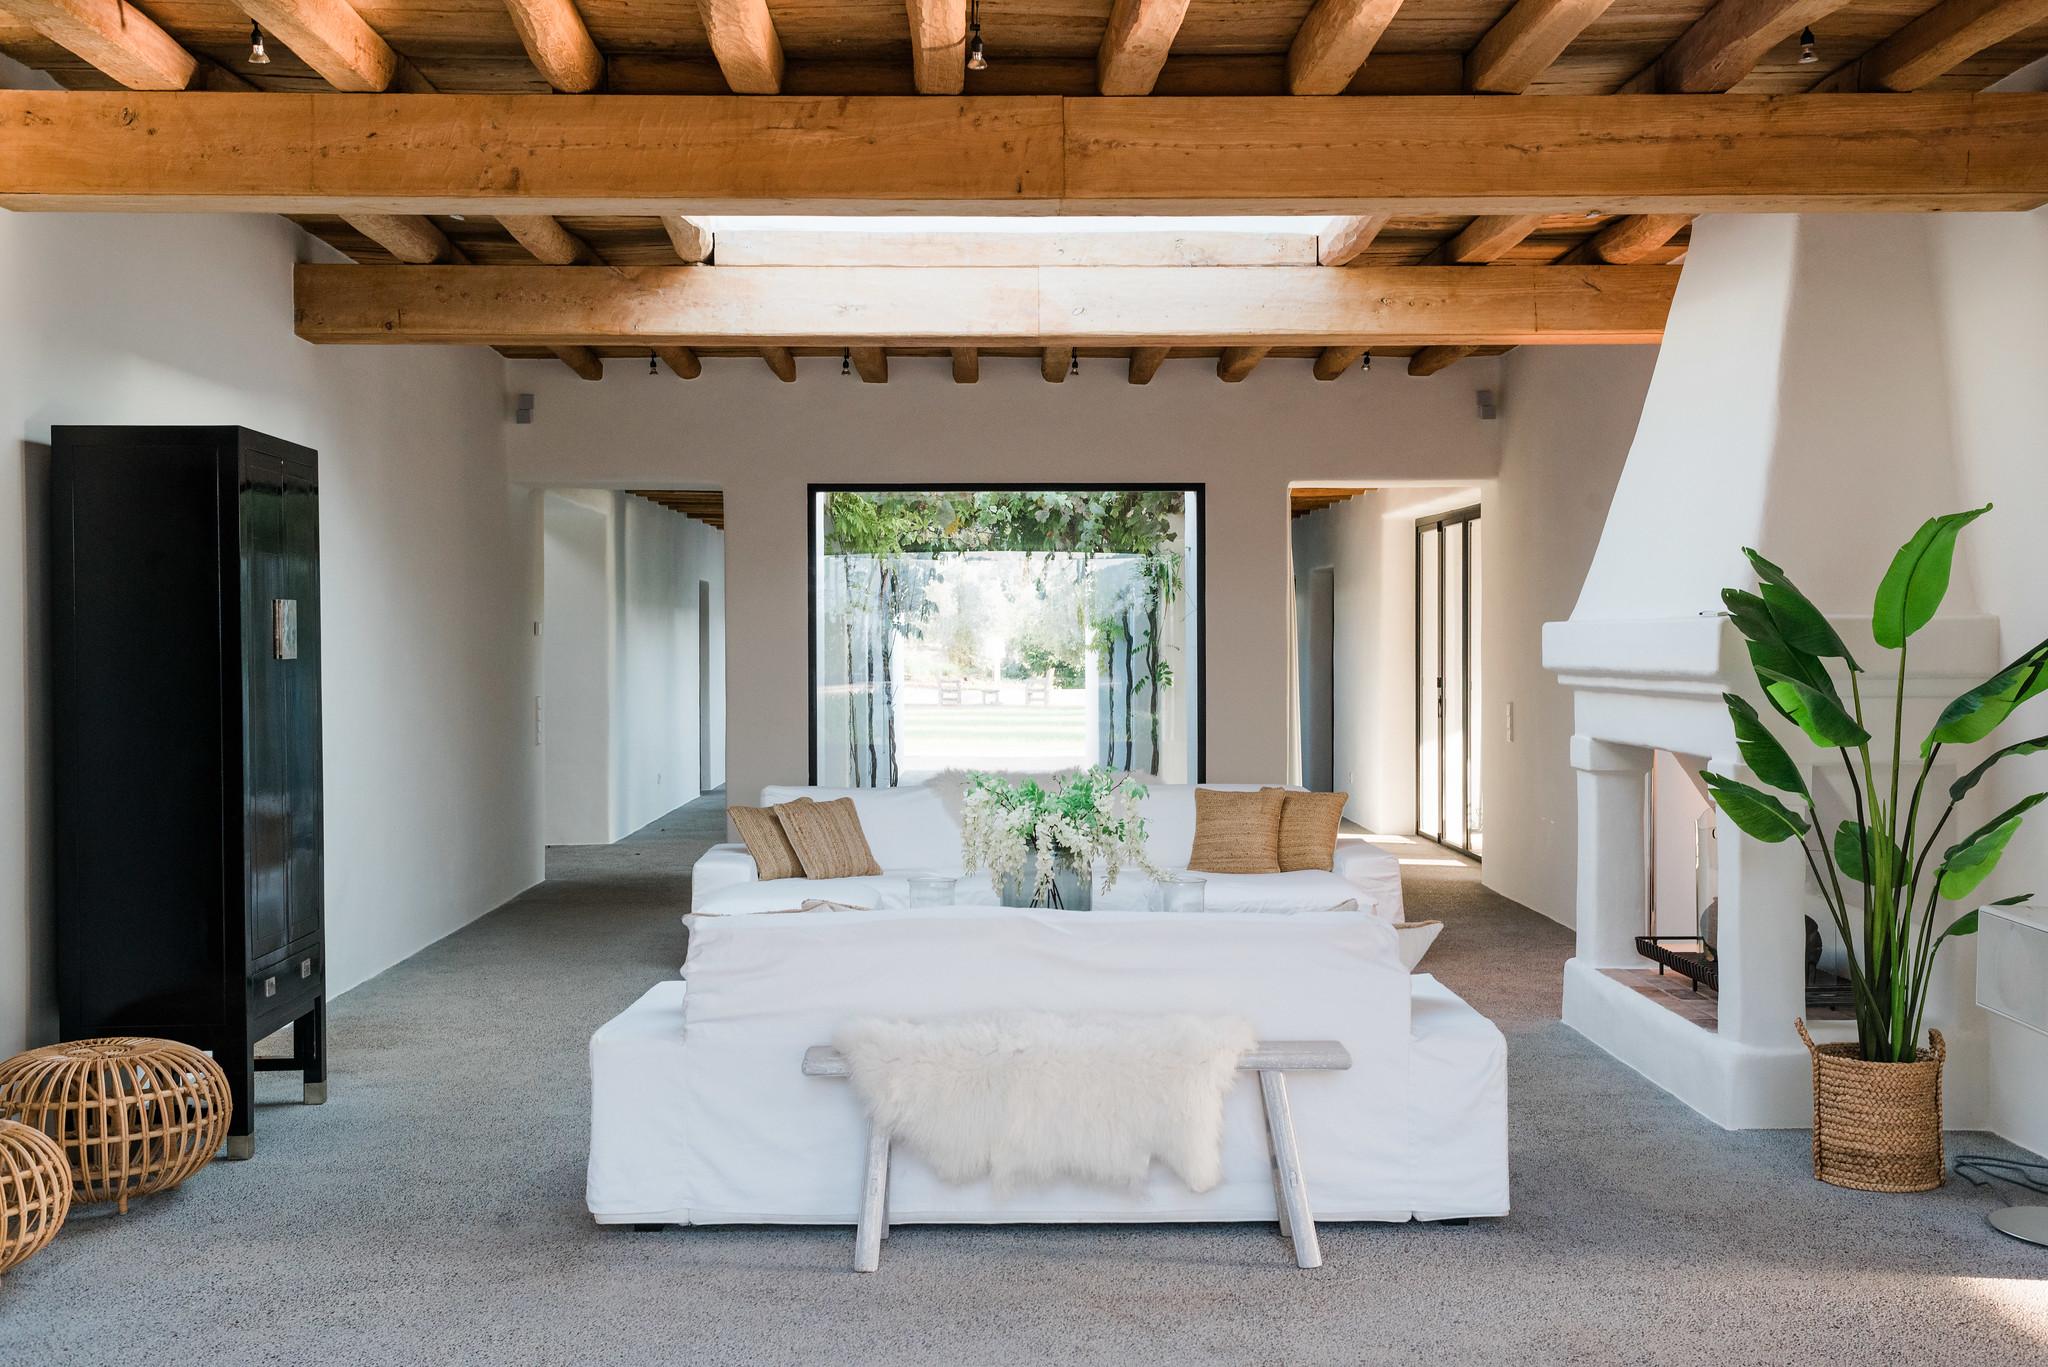 https://www.white-ibiza.com/wp-content/uploads/2020/05/white-ibiza-villas-can-terra-living-room.jpg